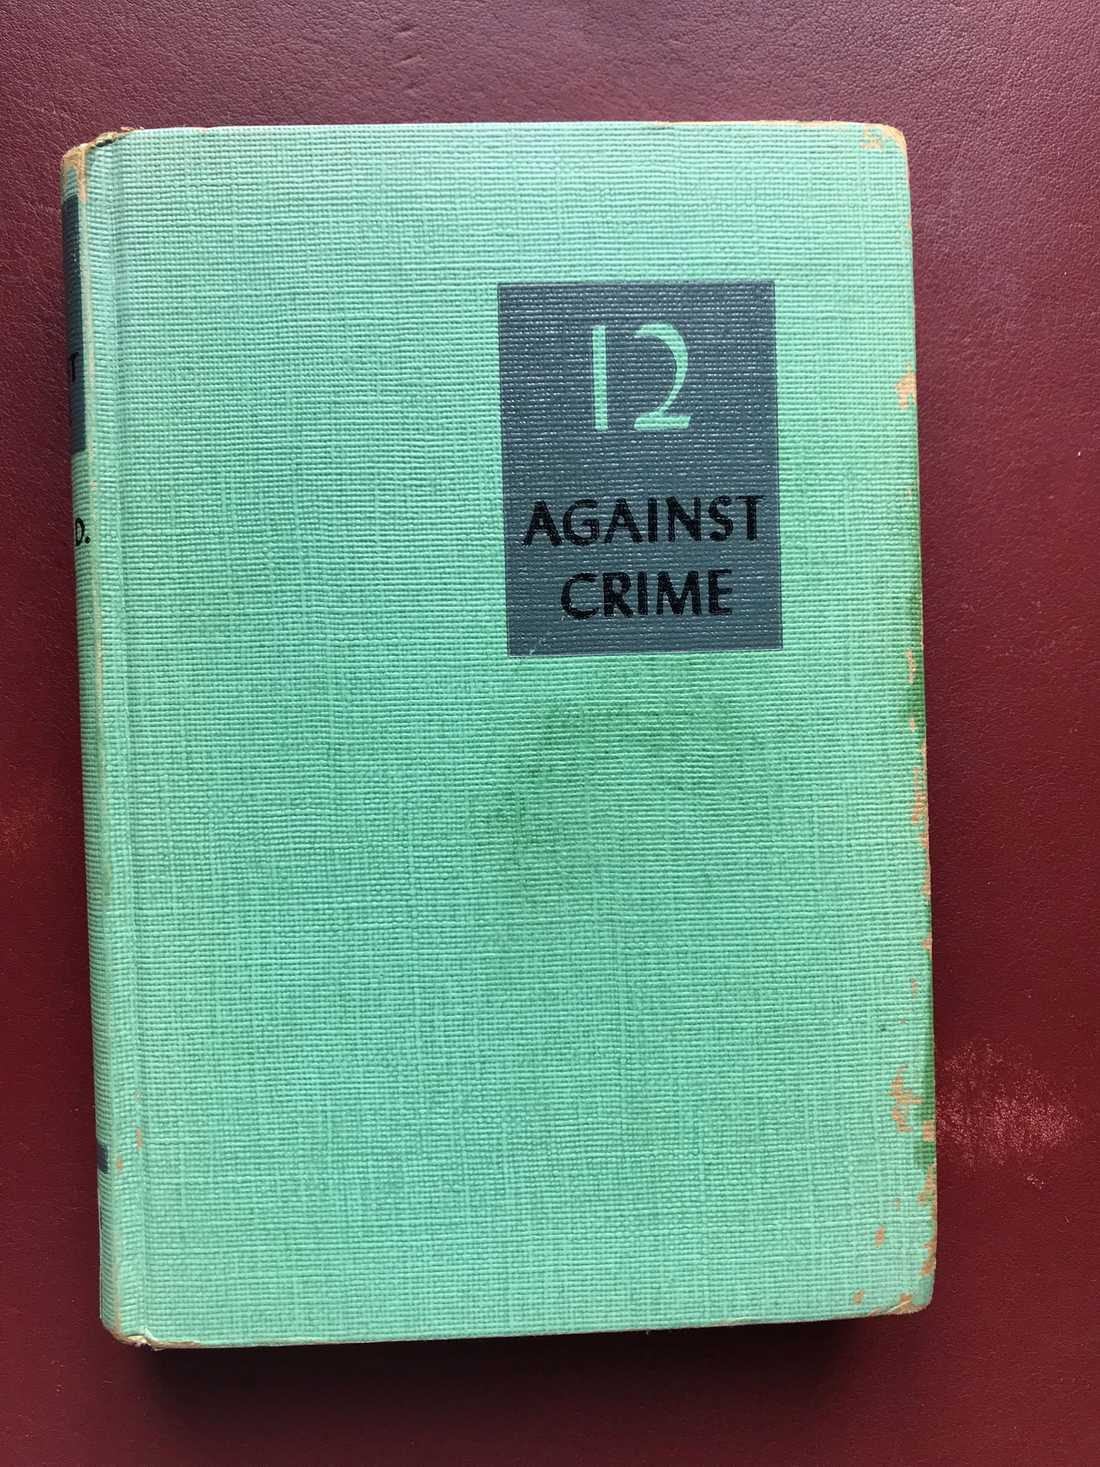 Exemplaret av 12 Against Crime av Edward D. Radin som Kadhammar hittade i Jerusalem.